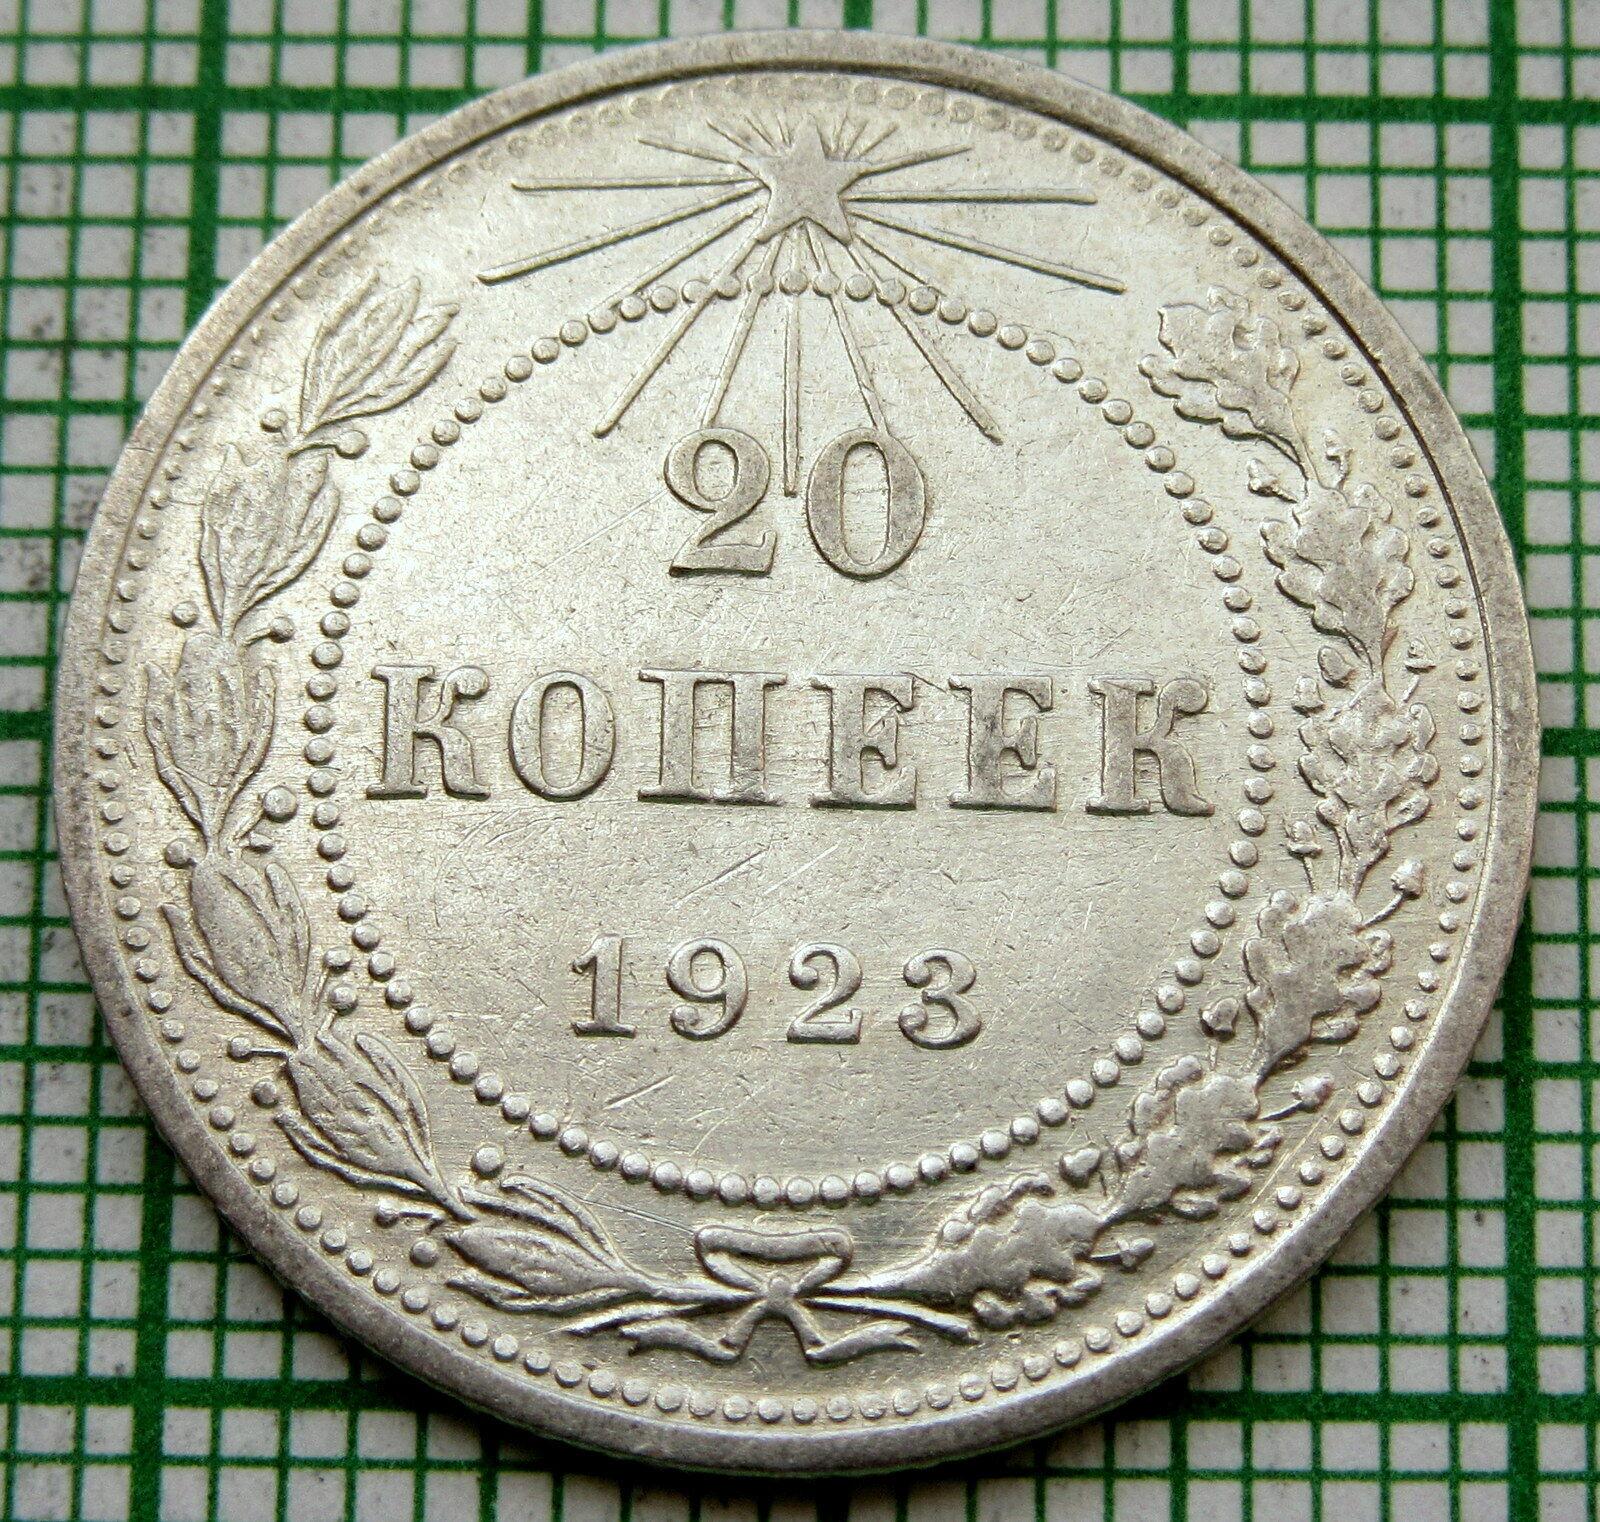 RUSSIA RSFSR 1923 20 KOPEKS, SILVER